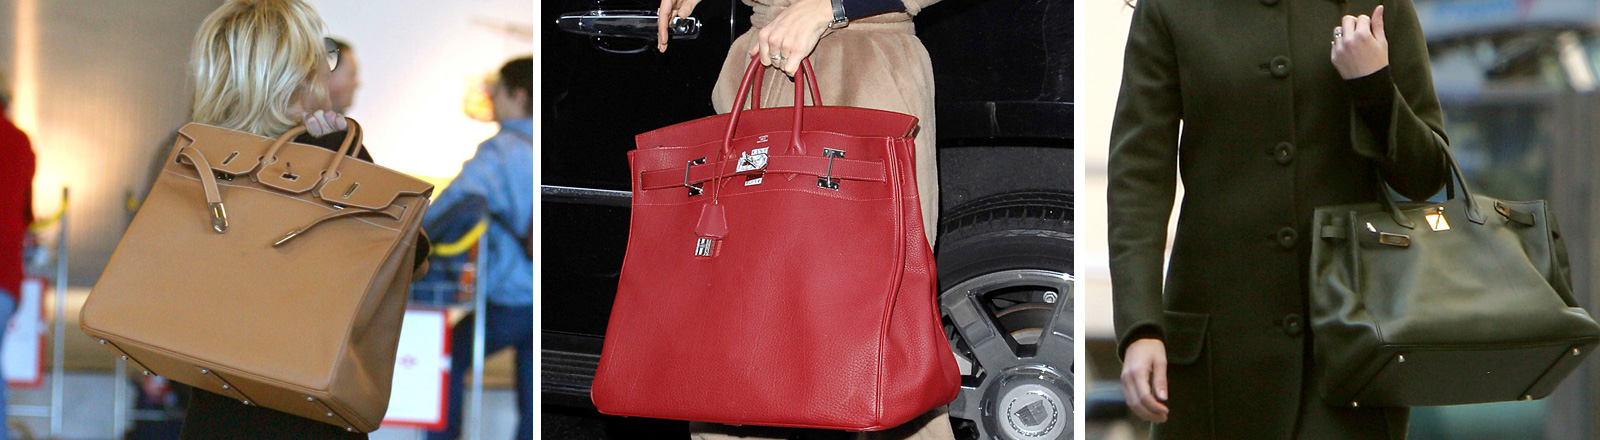 Pamela Anderson mit Birkin Bag. Katie Holmes mit Birkin Bag. Julia Roberts mit Birkin Bag.